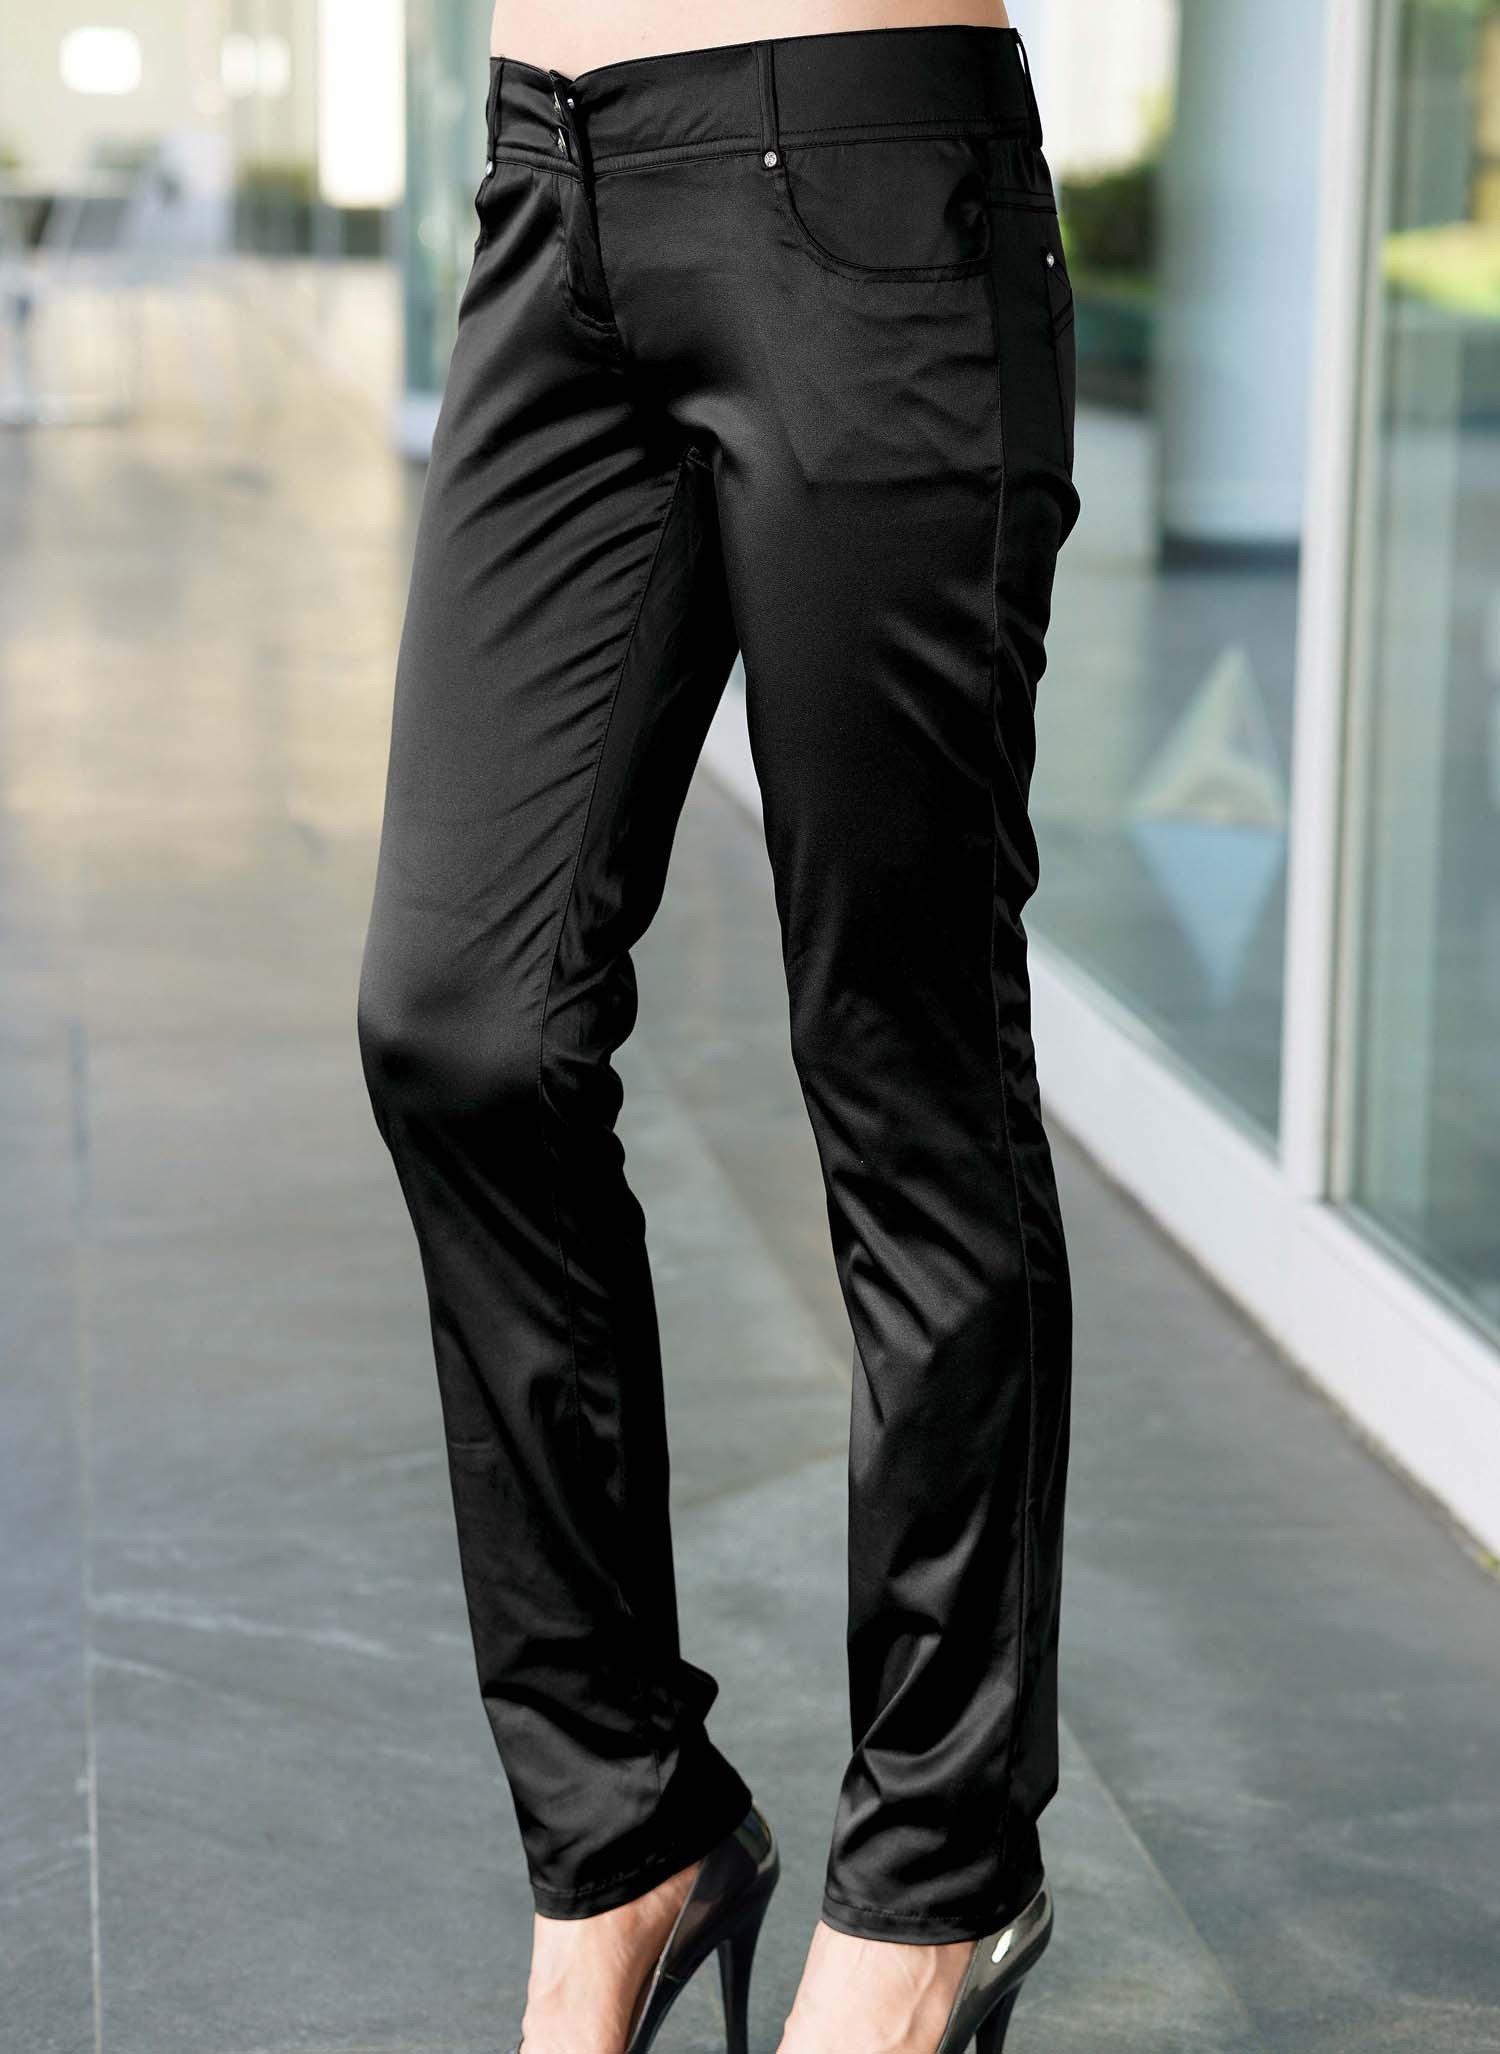 D-Pantalon satin,5p. noir